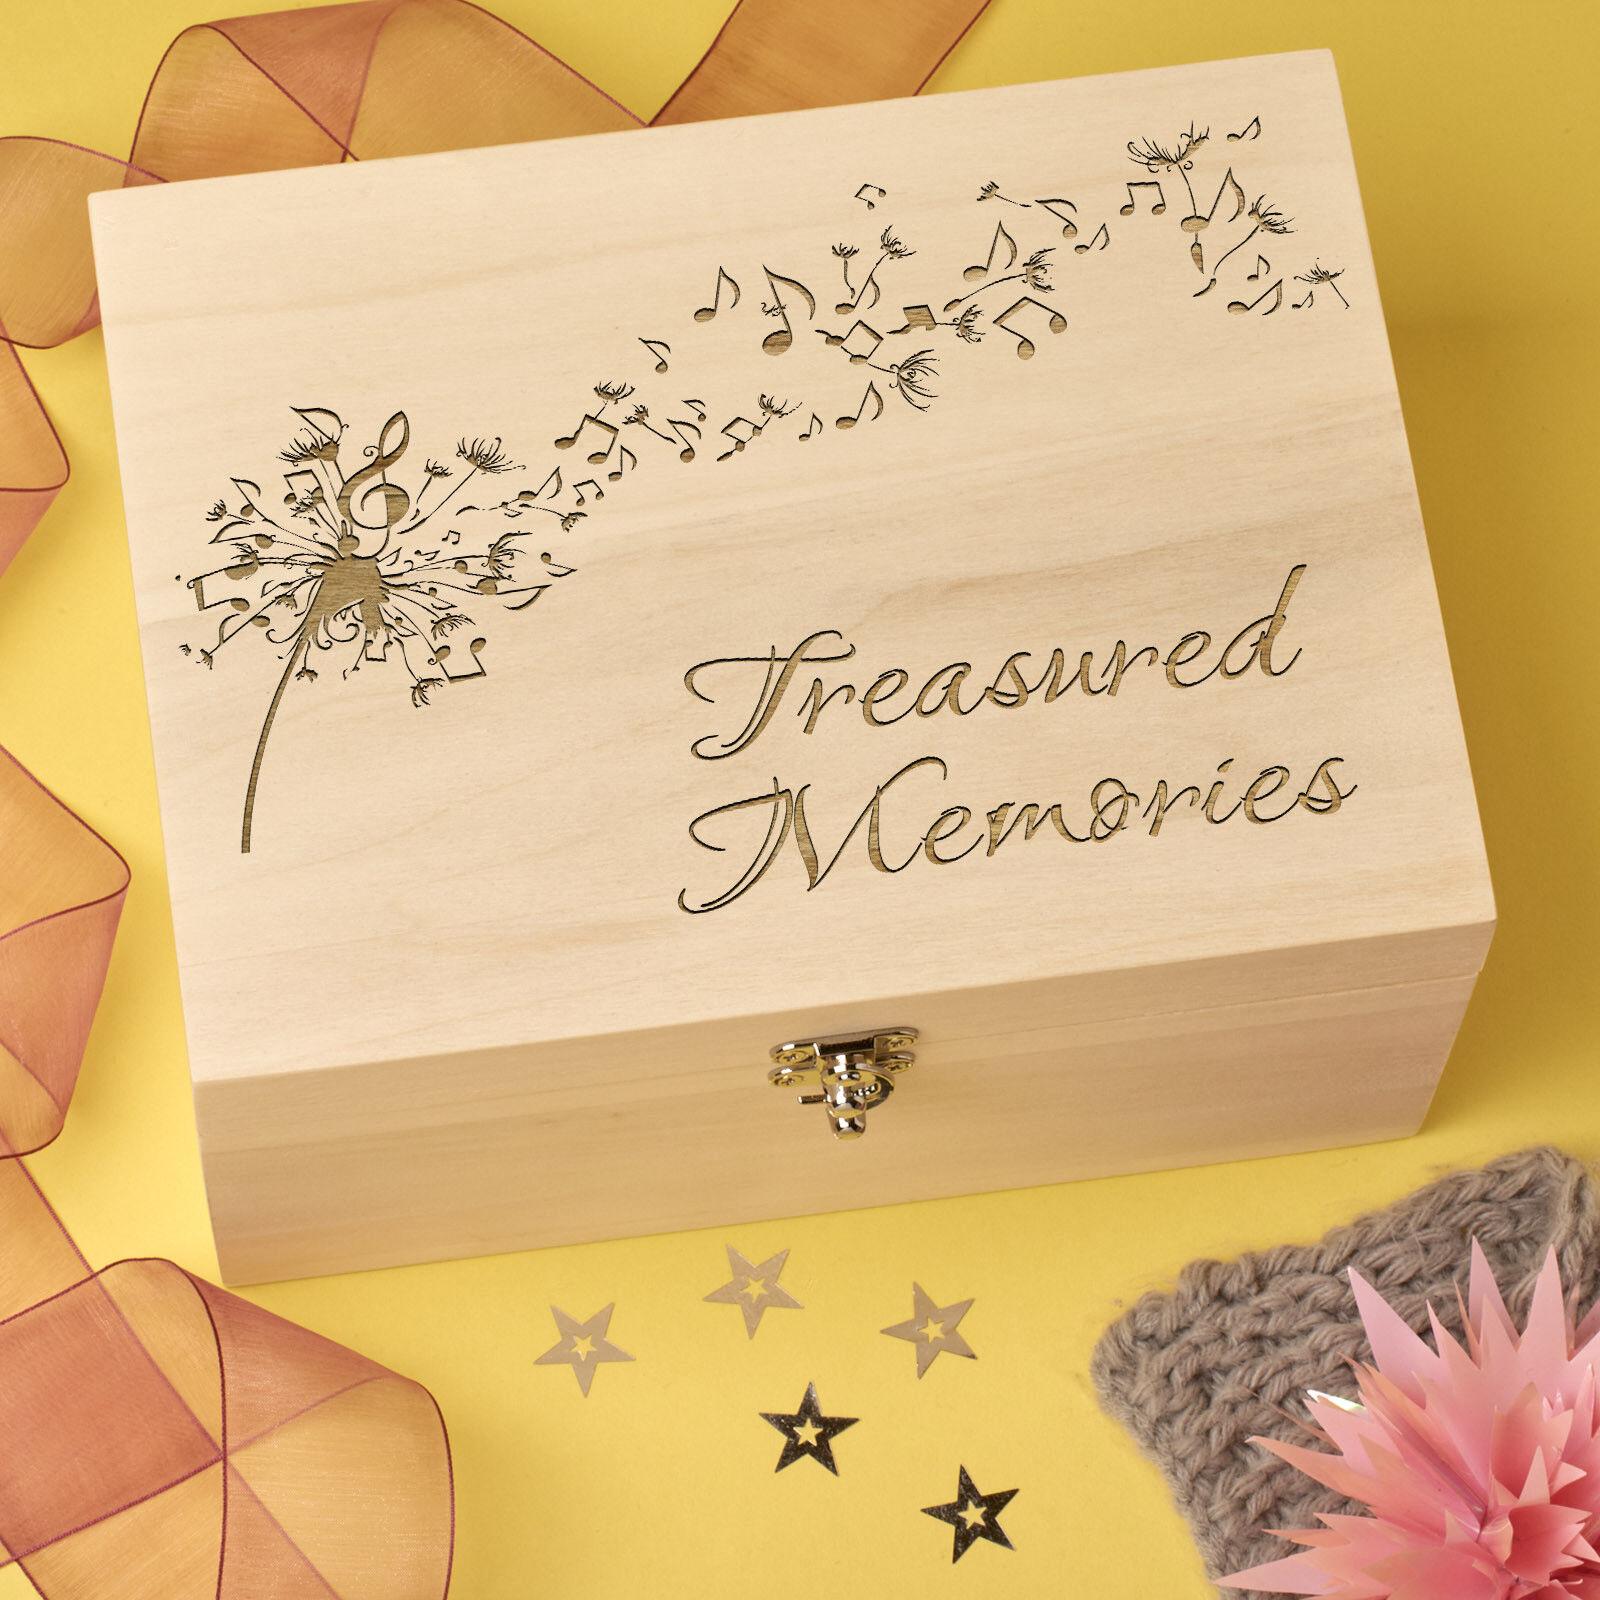 Personalised Laser Engraved Wooden Keepsake, Memory Box - Dandelion Design